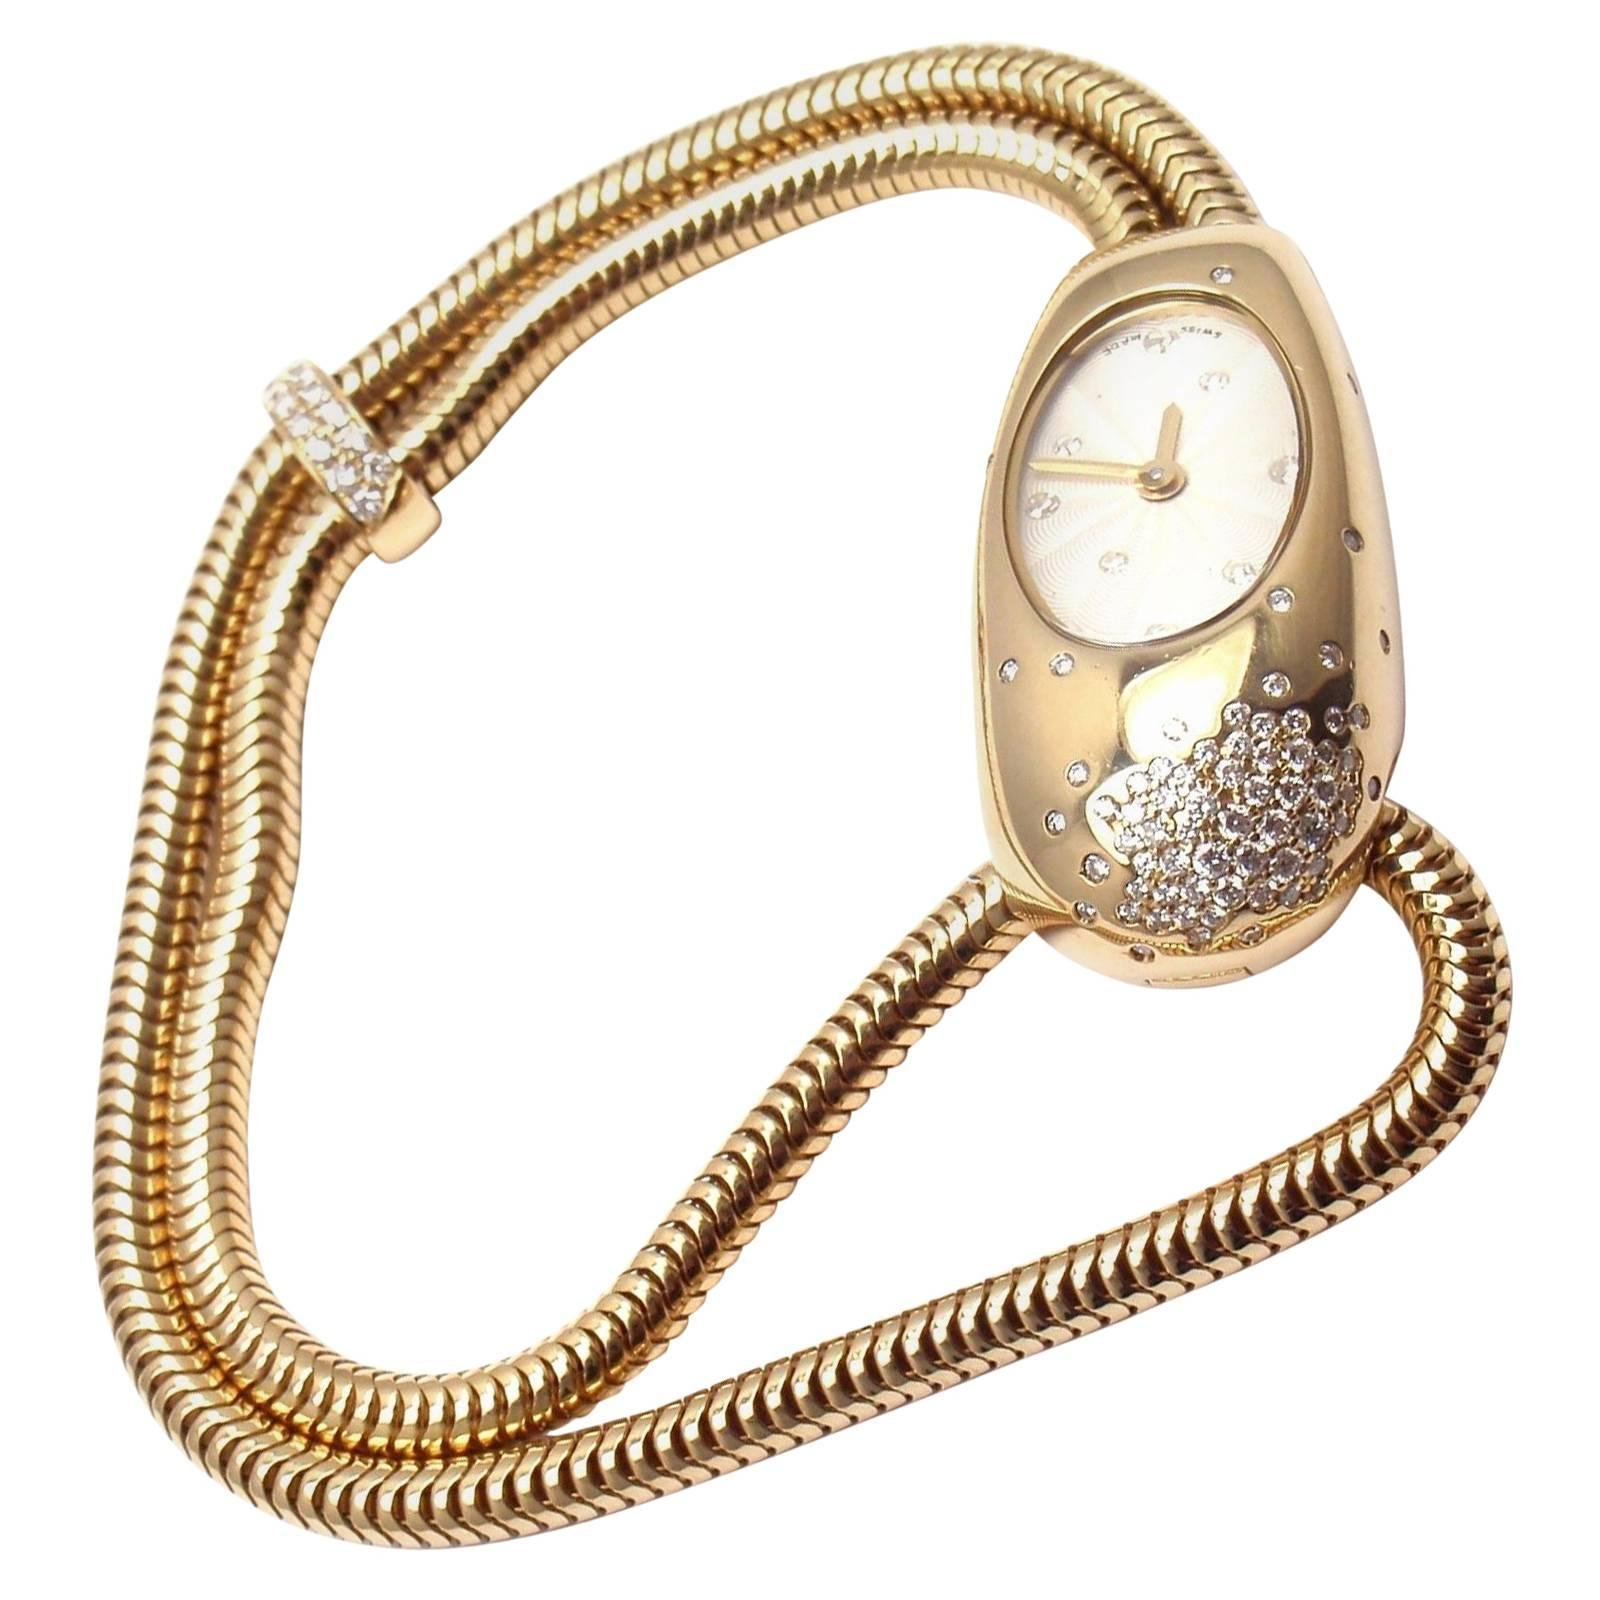 Van Cleef & Arpels Ladies Yellow Gold Diamond Cadenas Serti Quartz Wristwatch